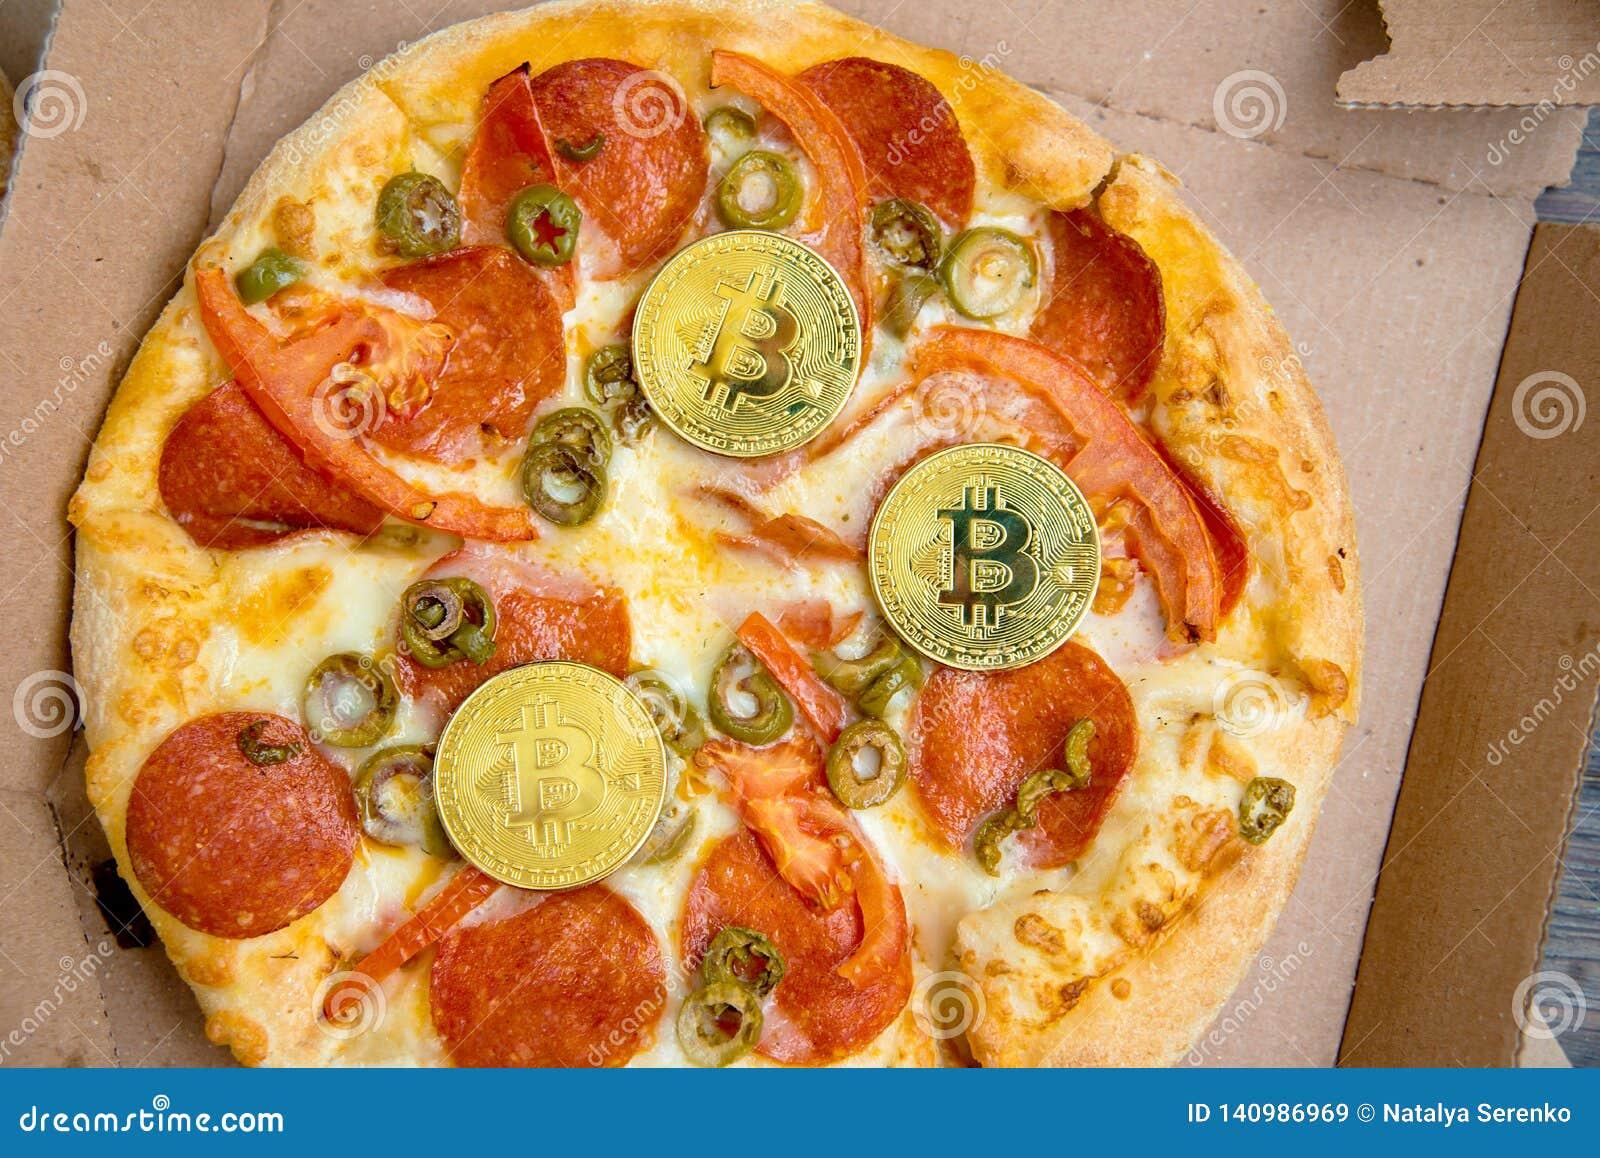 bitcoin pizza index